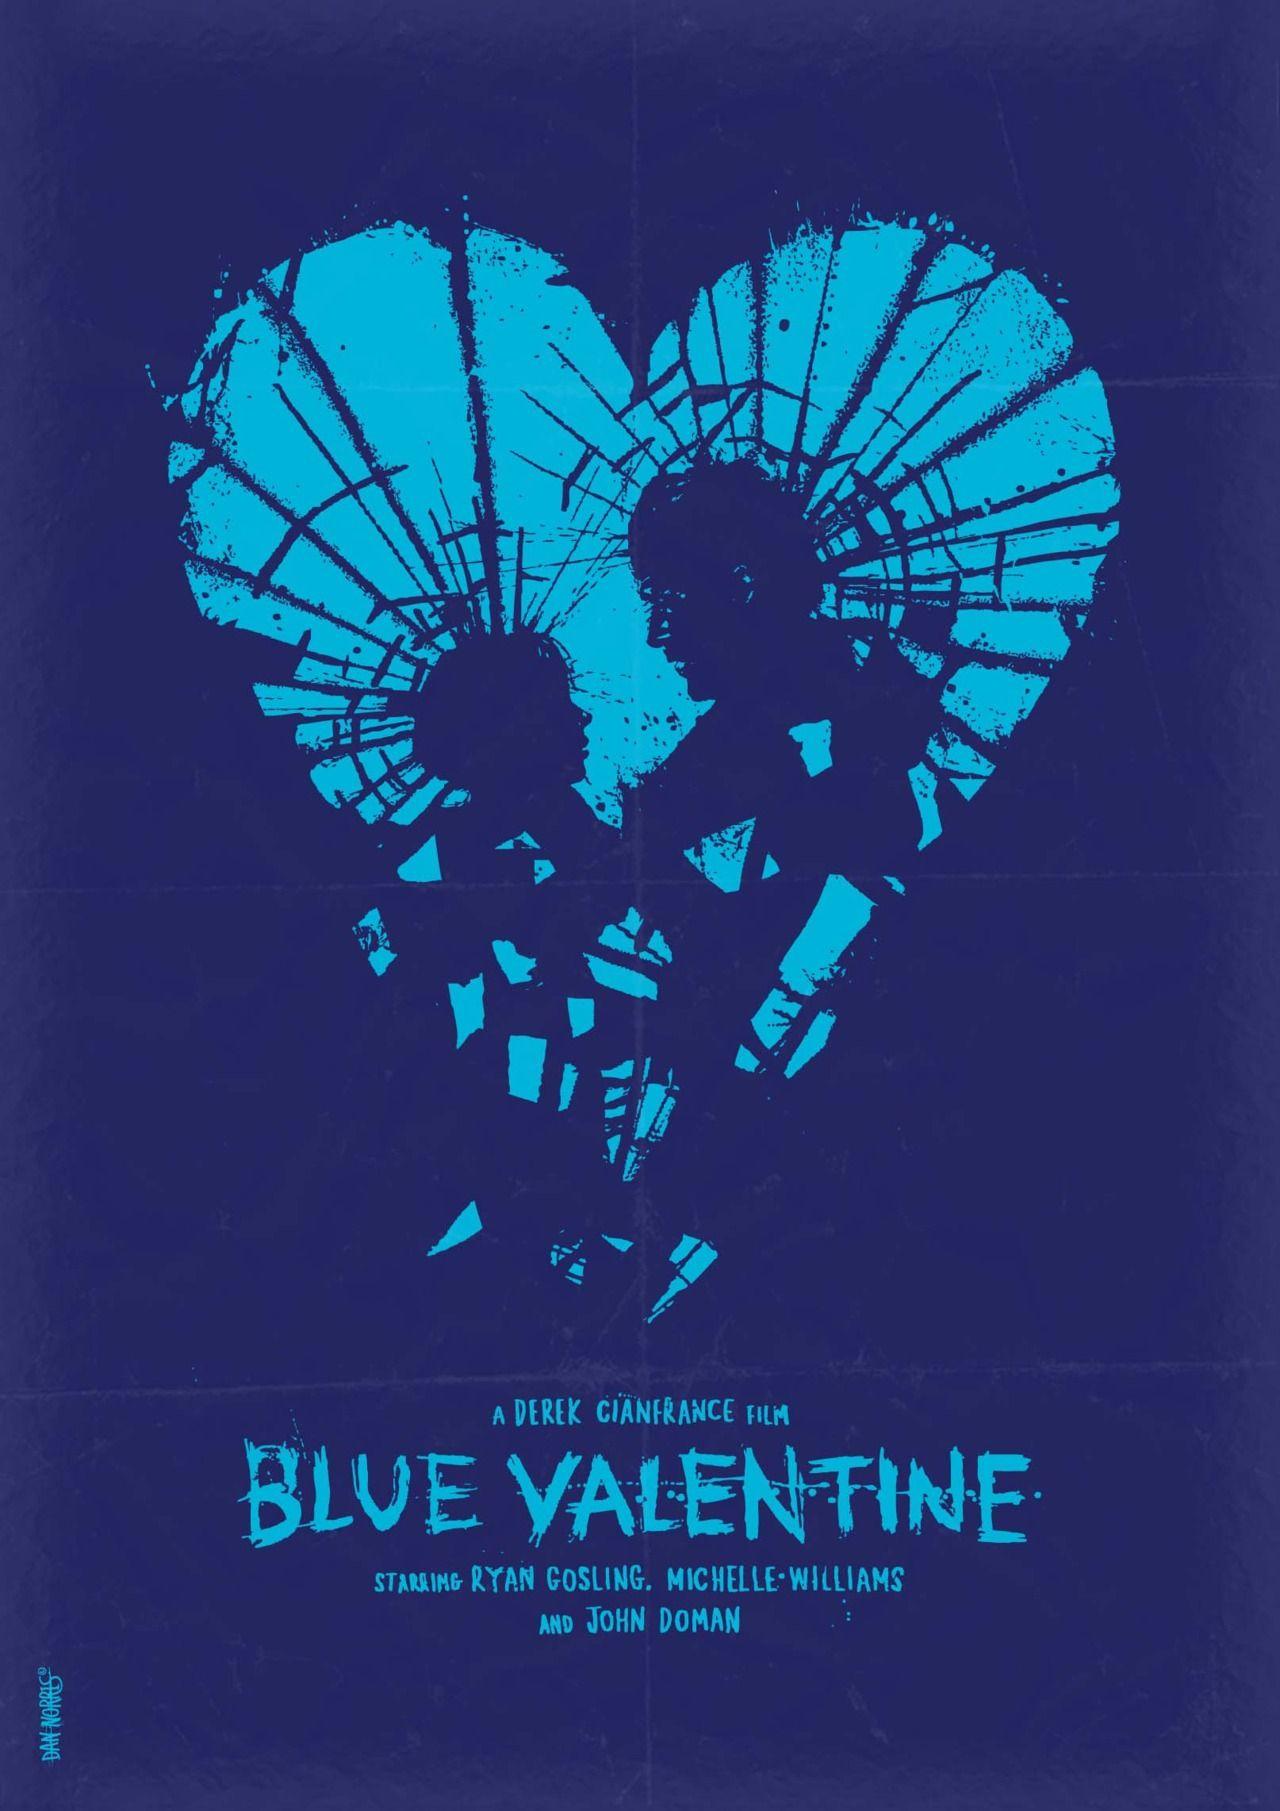 Poster design tumblr - Blue Valentine